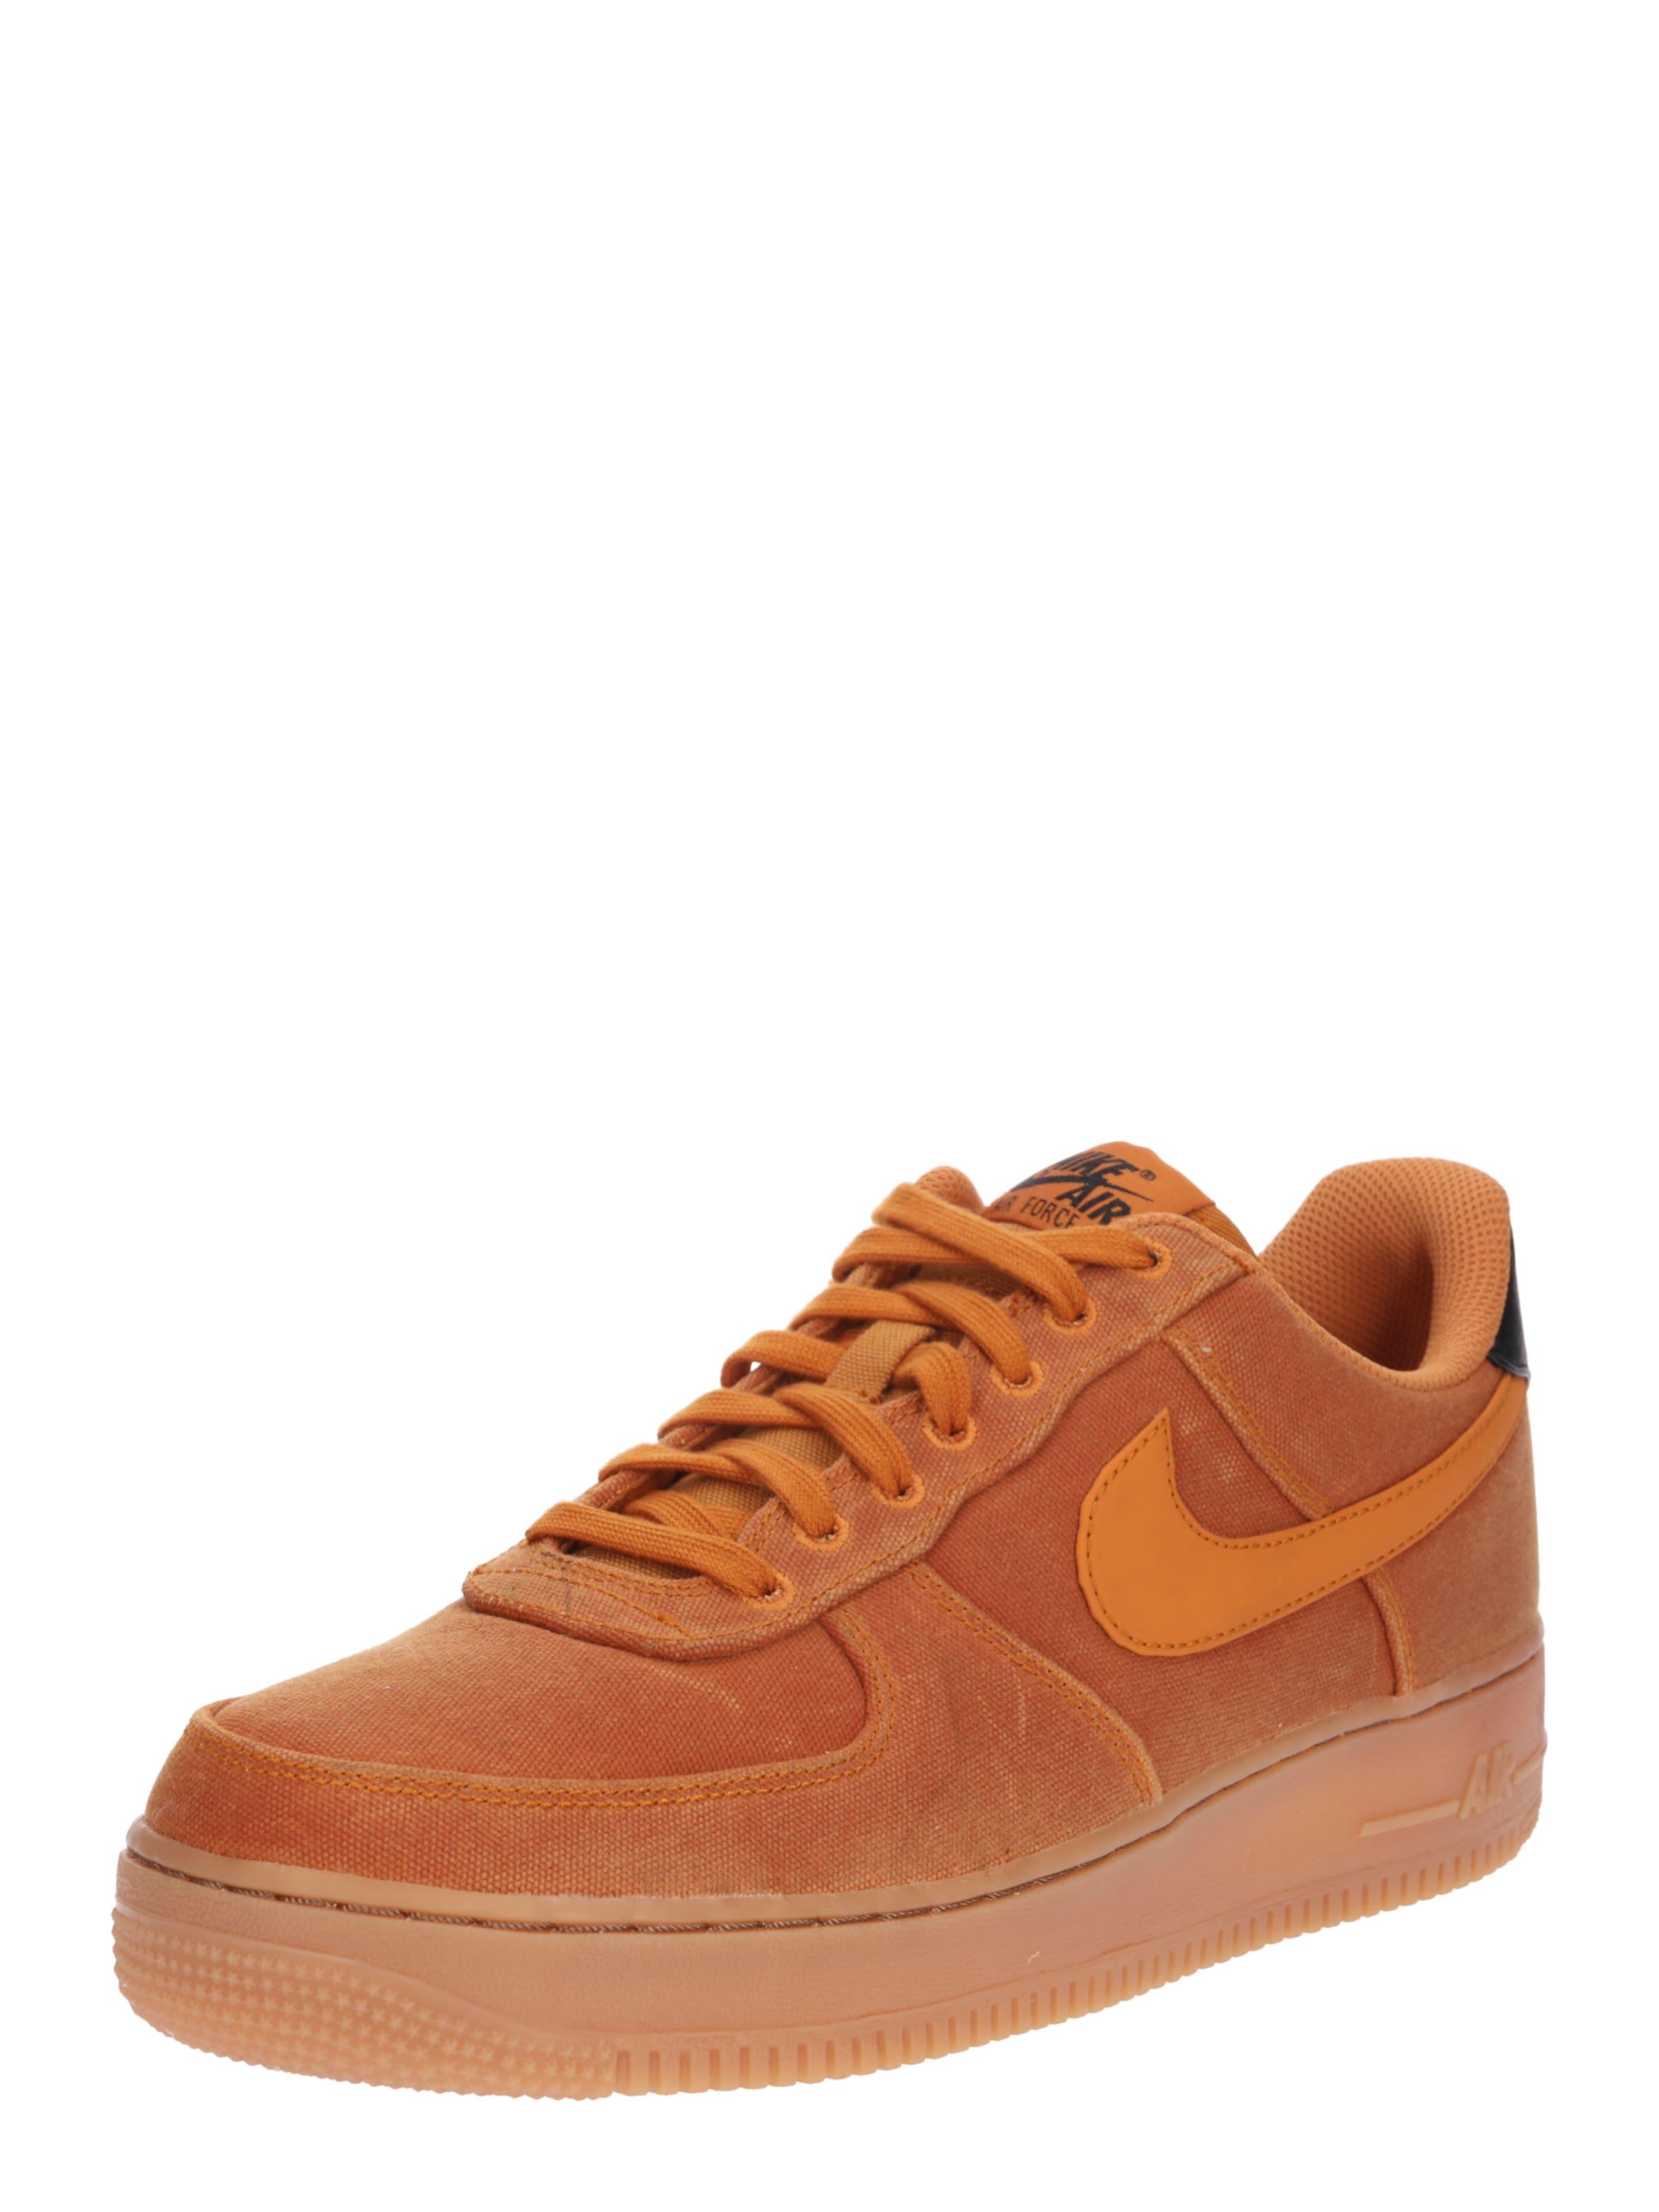 Sneaker 1 In Cognac Force Sportswear Lv8' Nike 'air OkZiTwuPXl